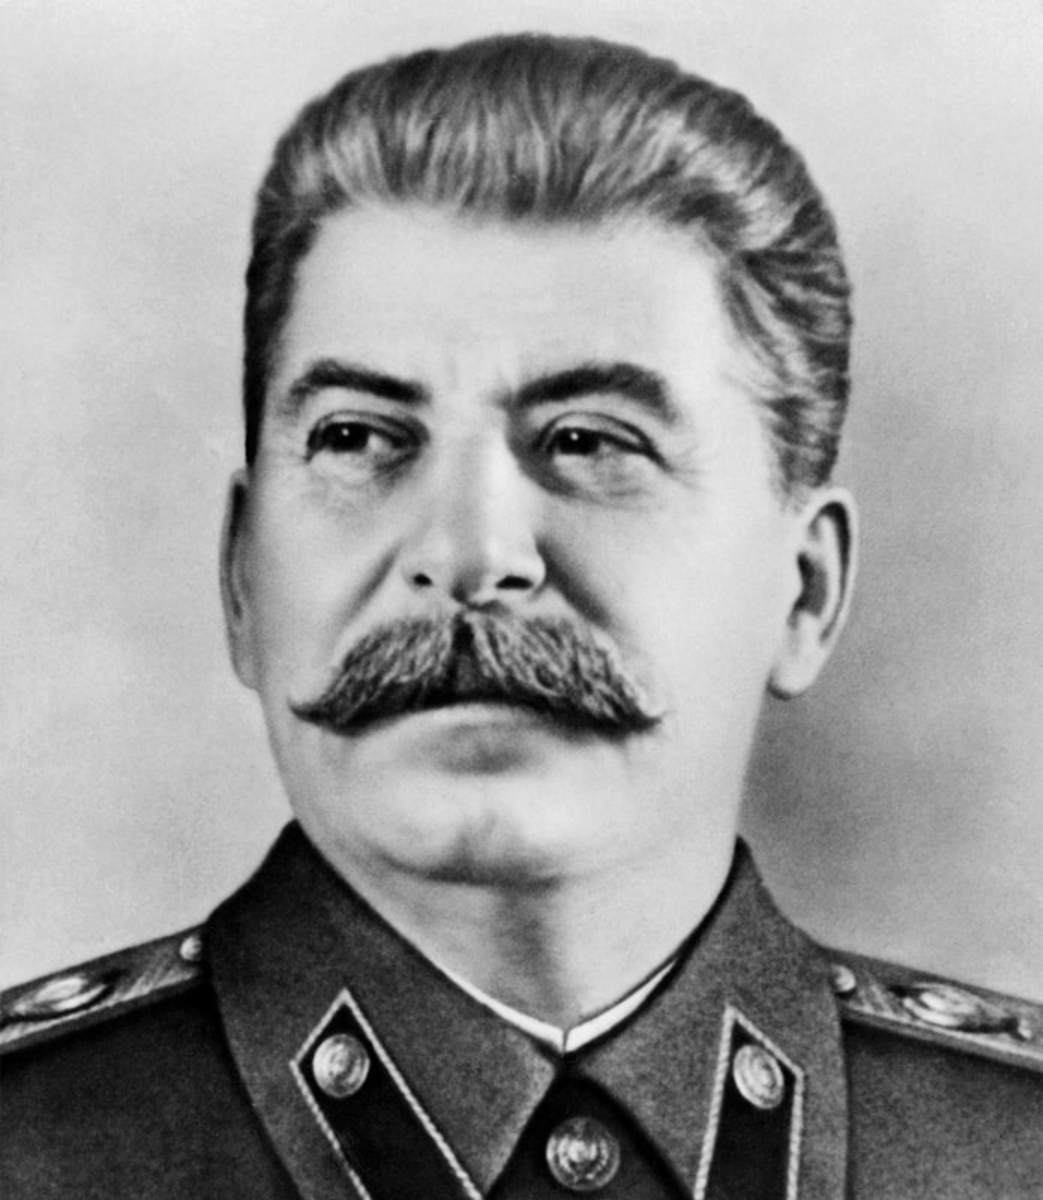 Joseph Stalin: Quick Facts